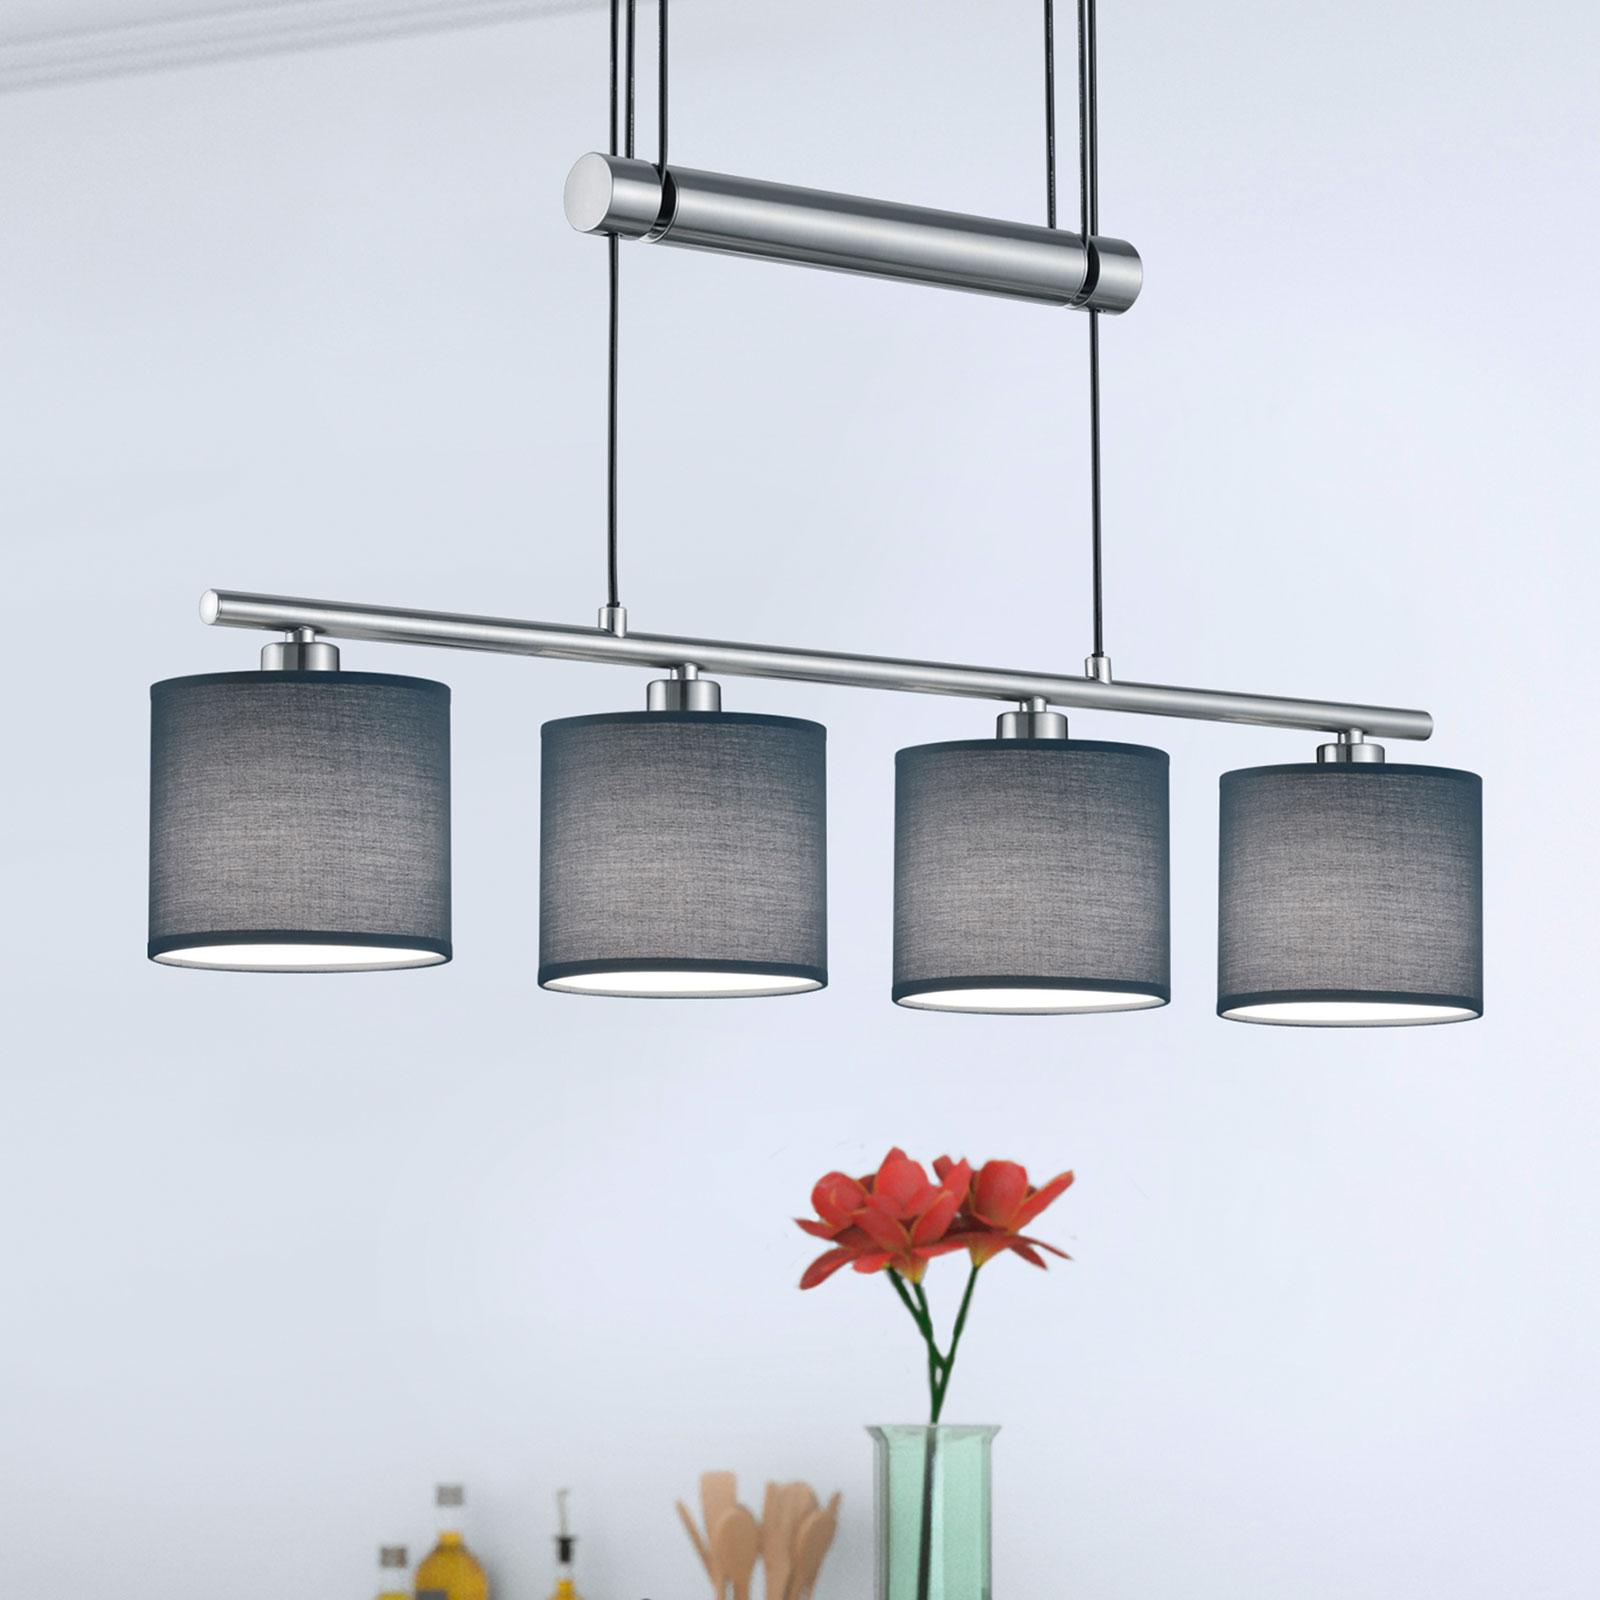 Stofskærme grå - hængelampe Garda 4 lys